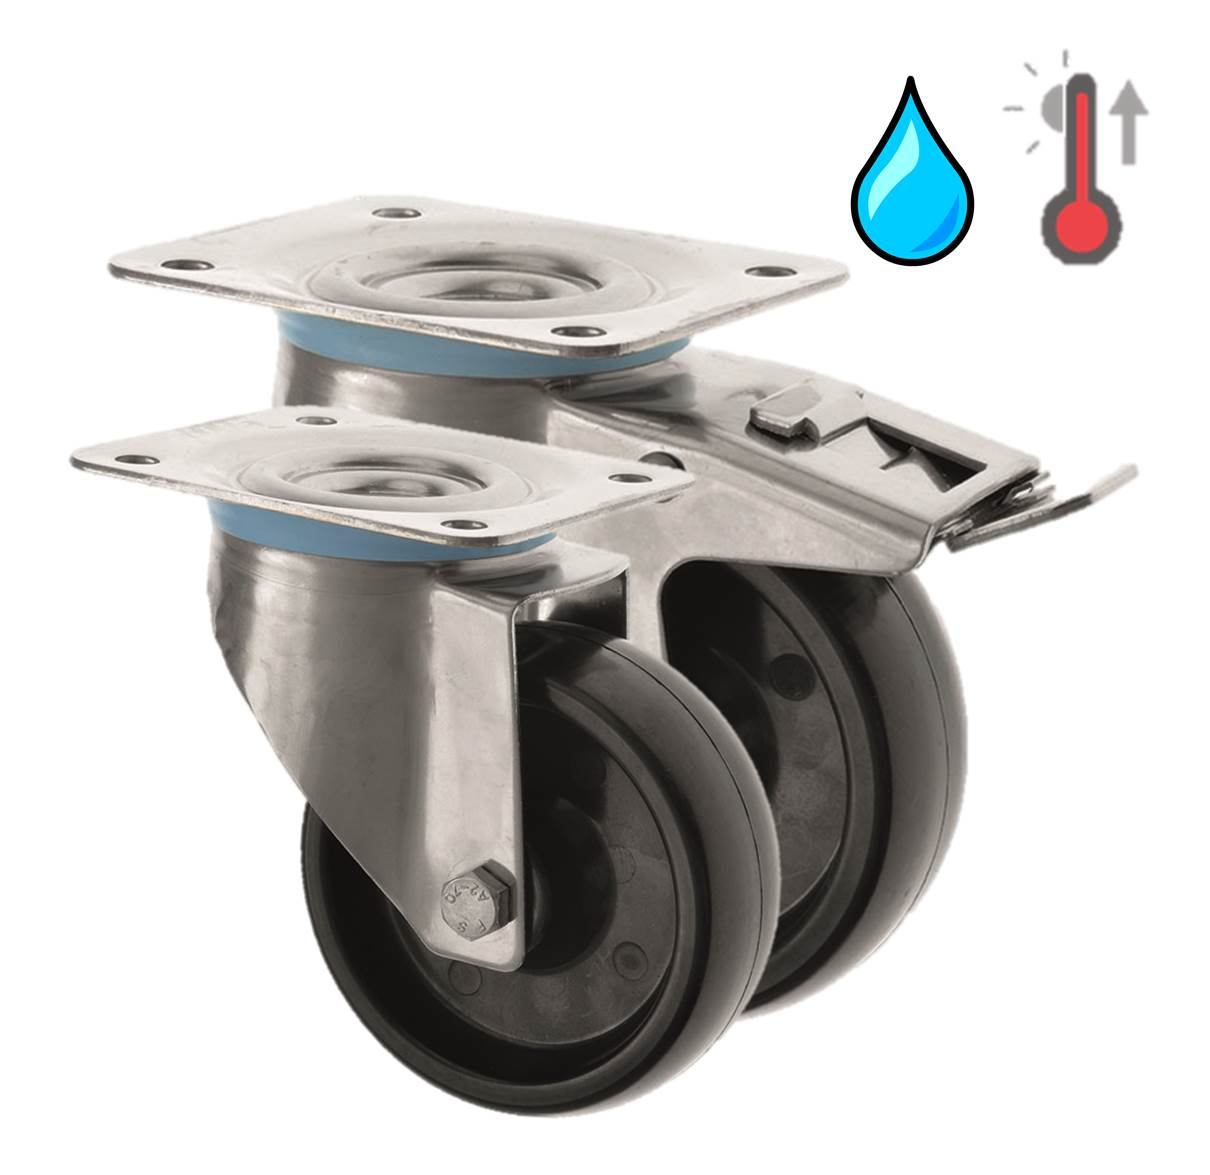 Stainless Steel High Temperature Castors Phenolic Resin